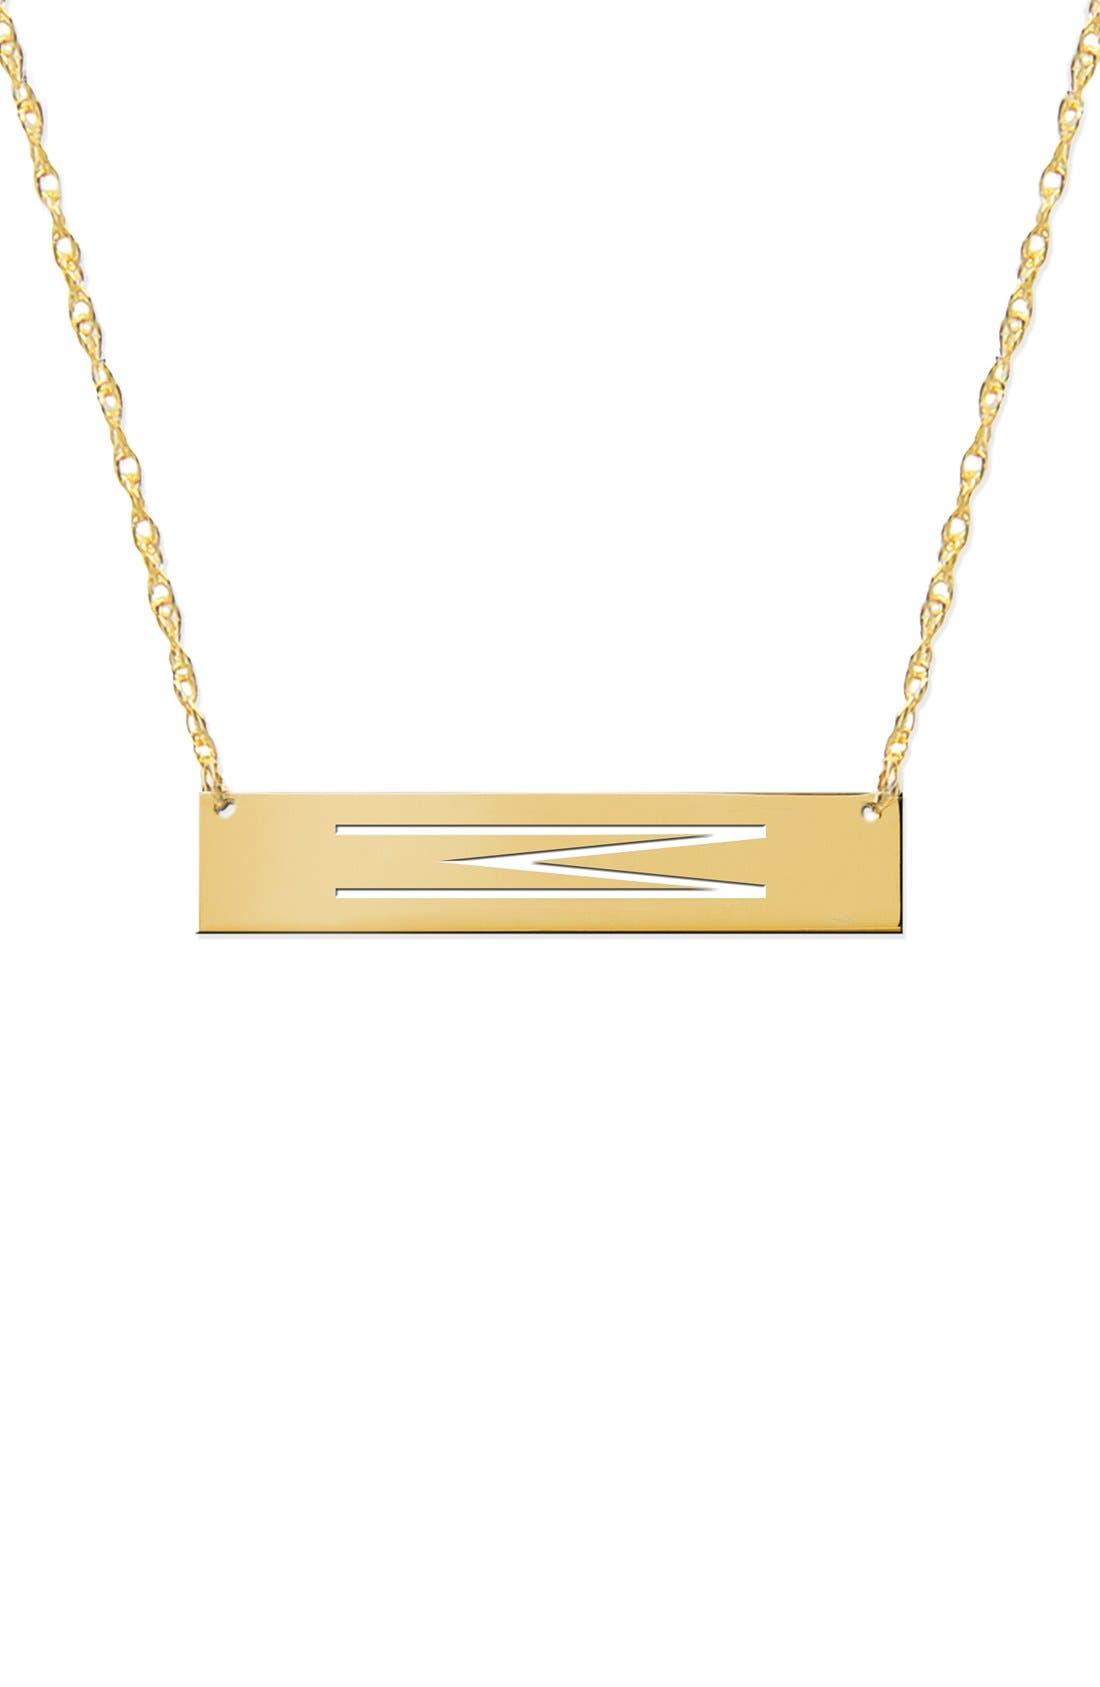 Personalized Bar Pendant Necklace,                             Main thumbnail 1, color,                             GOLD